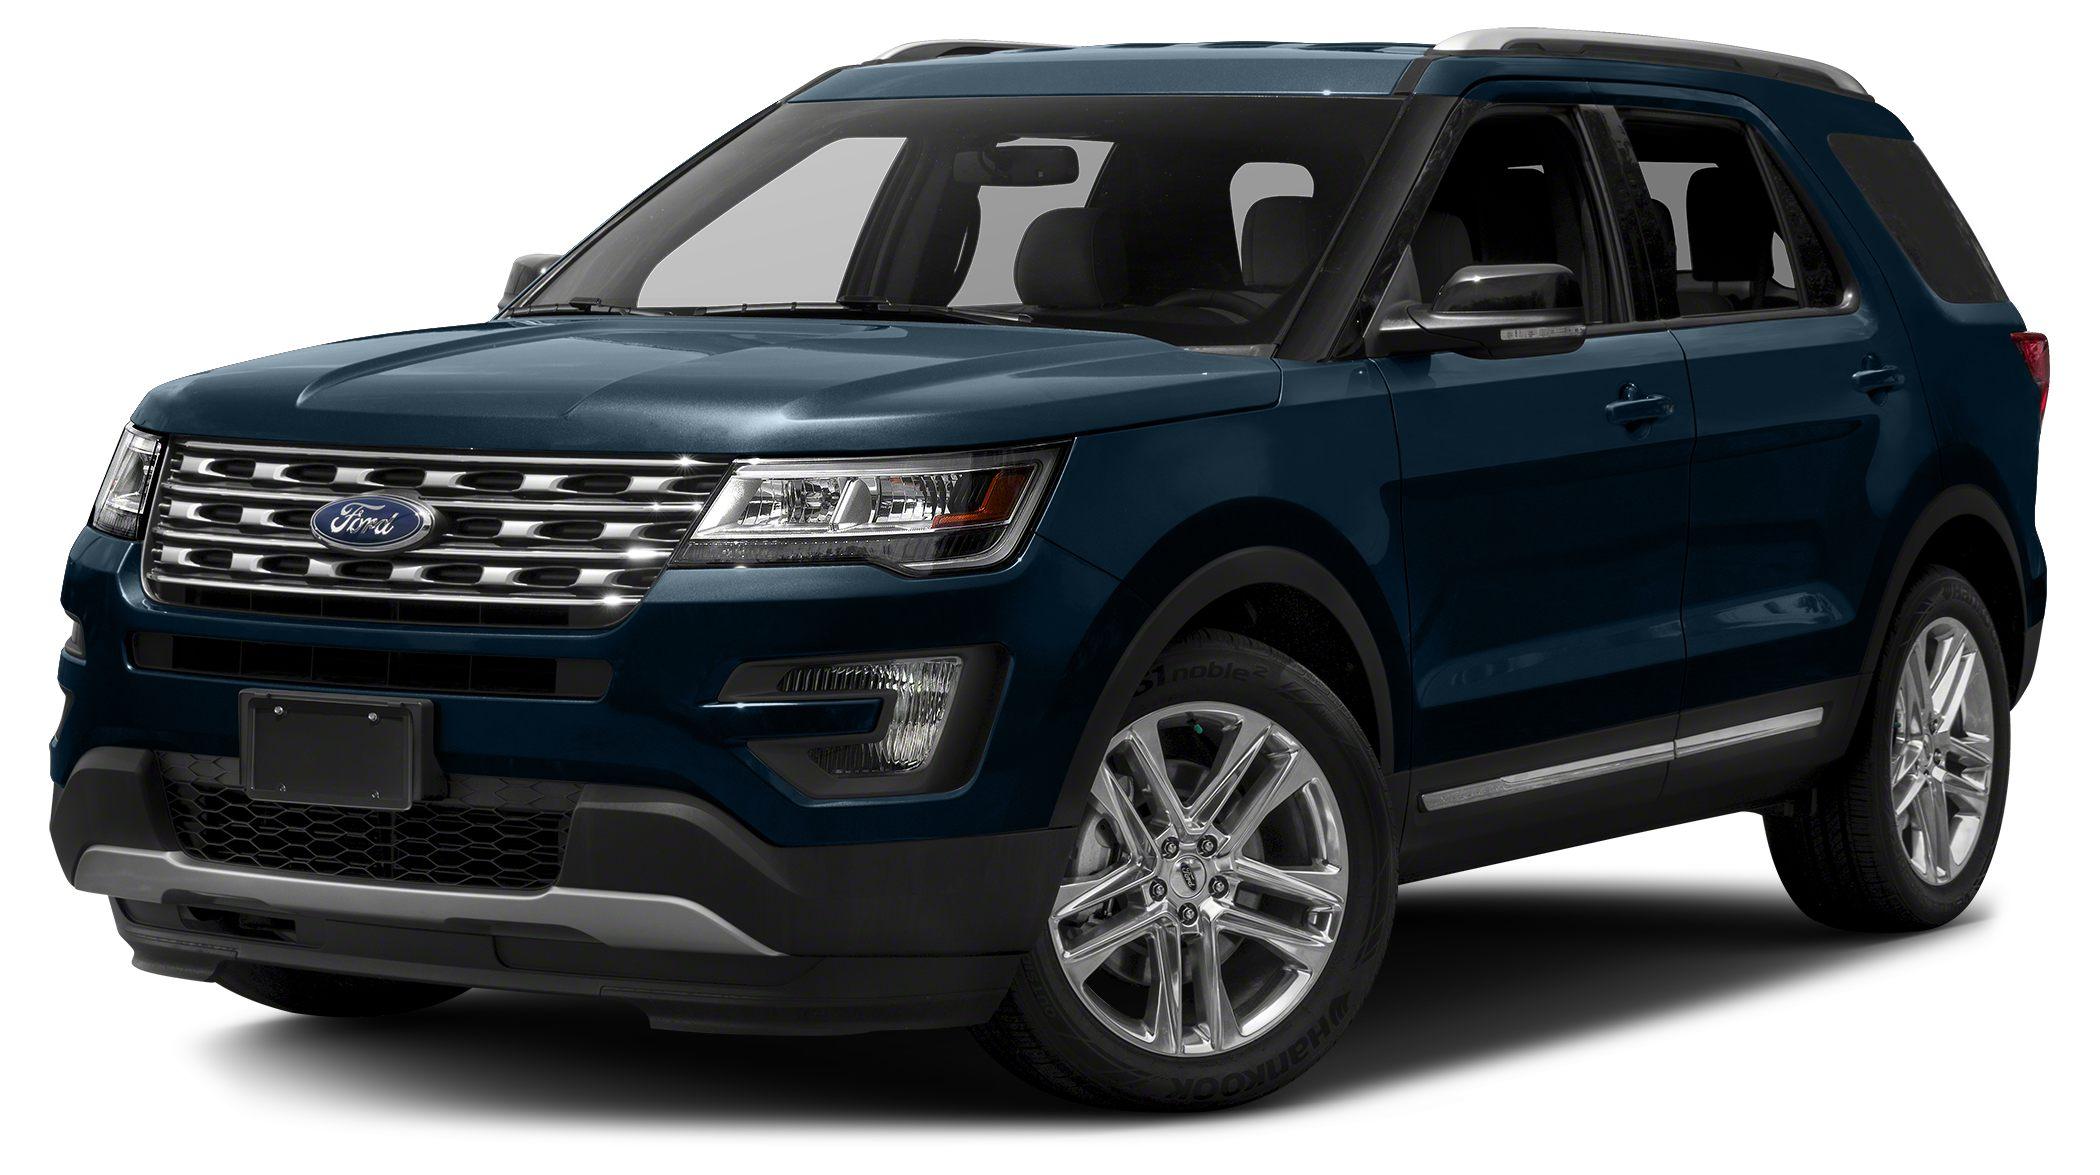 2016 Ford Explorer Limited Miles 5Color White Platinum Metallic Tri-Coat Stock 16T0137 VIN 1